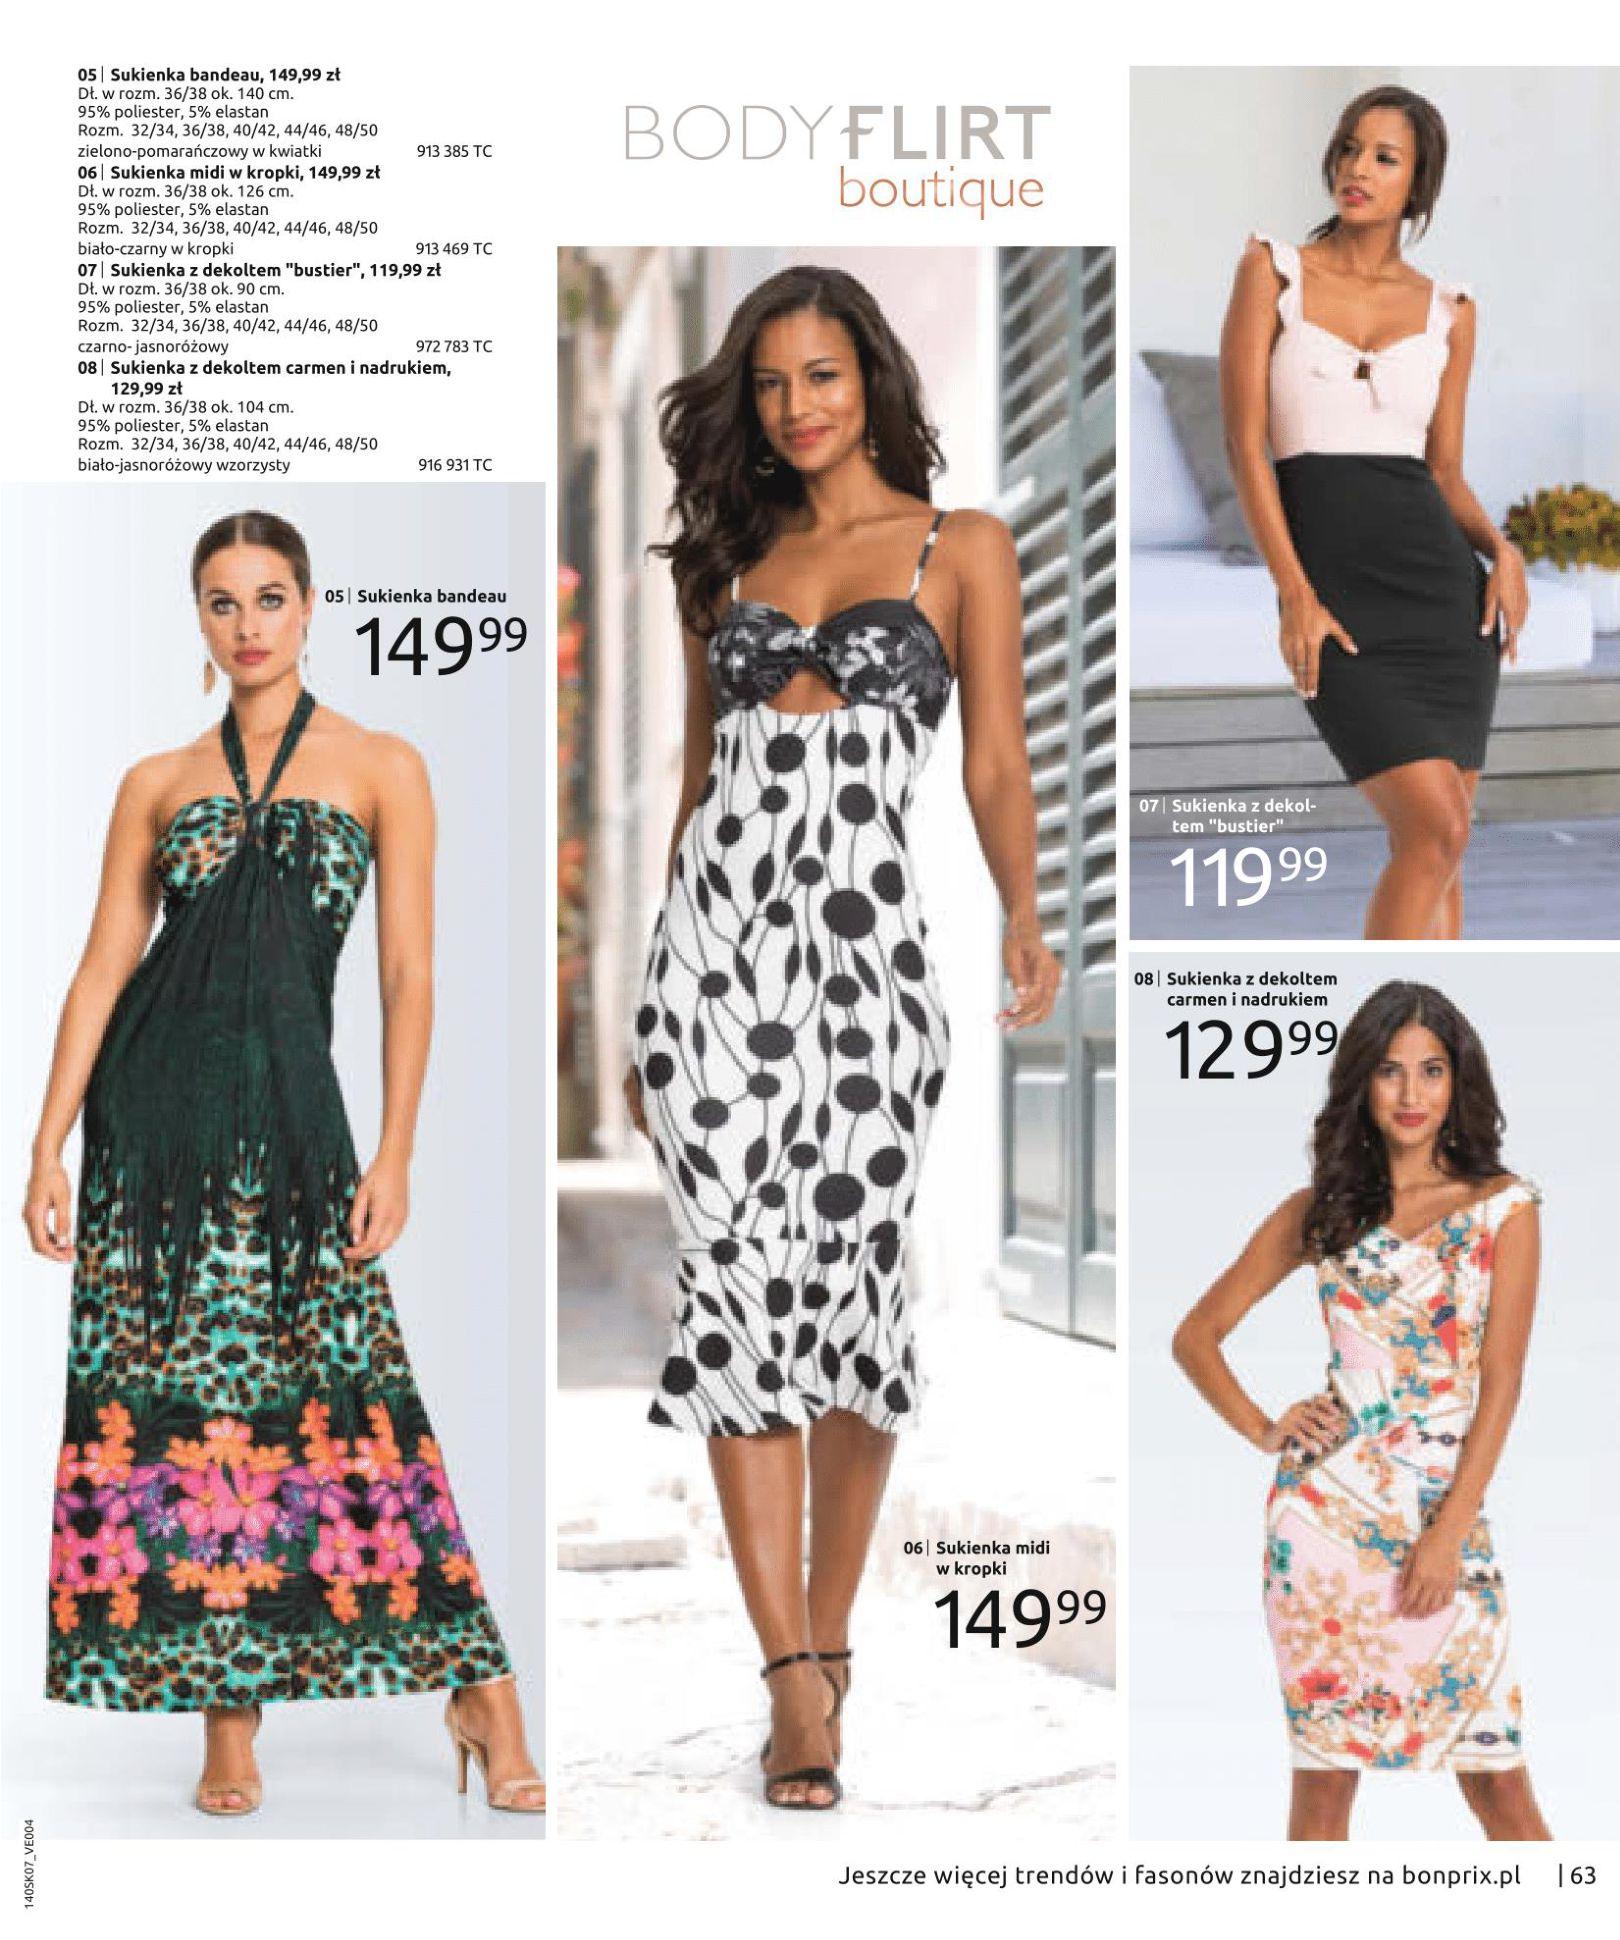 Gazetka Bonprix - Letnie trendy-02.07.2019-15.01.2020-page-65